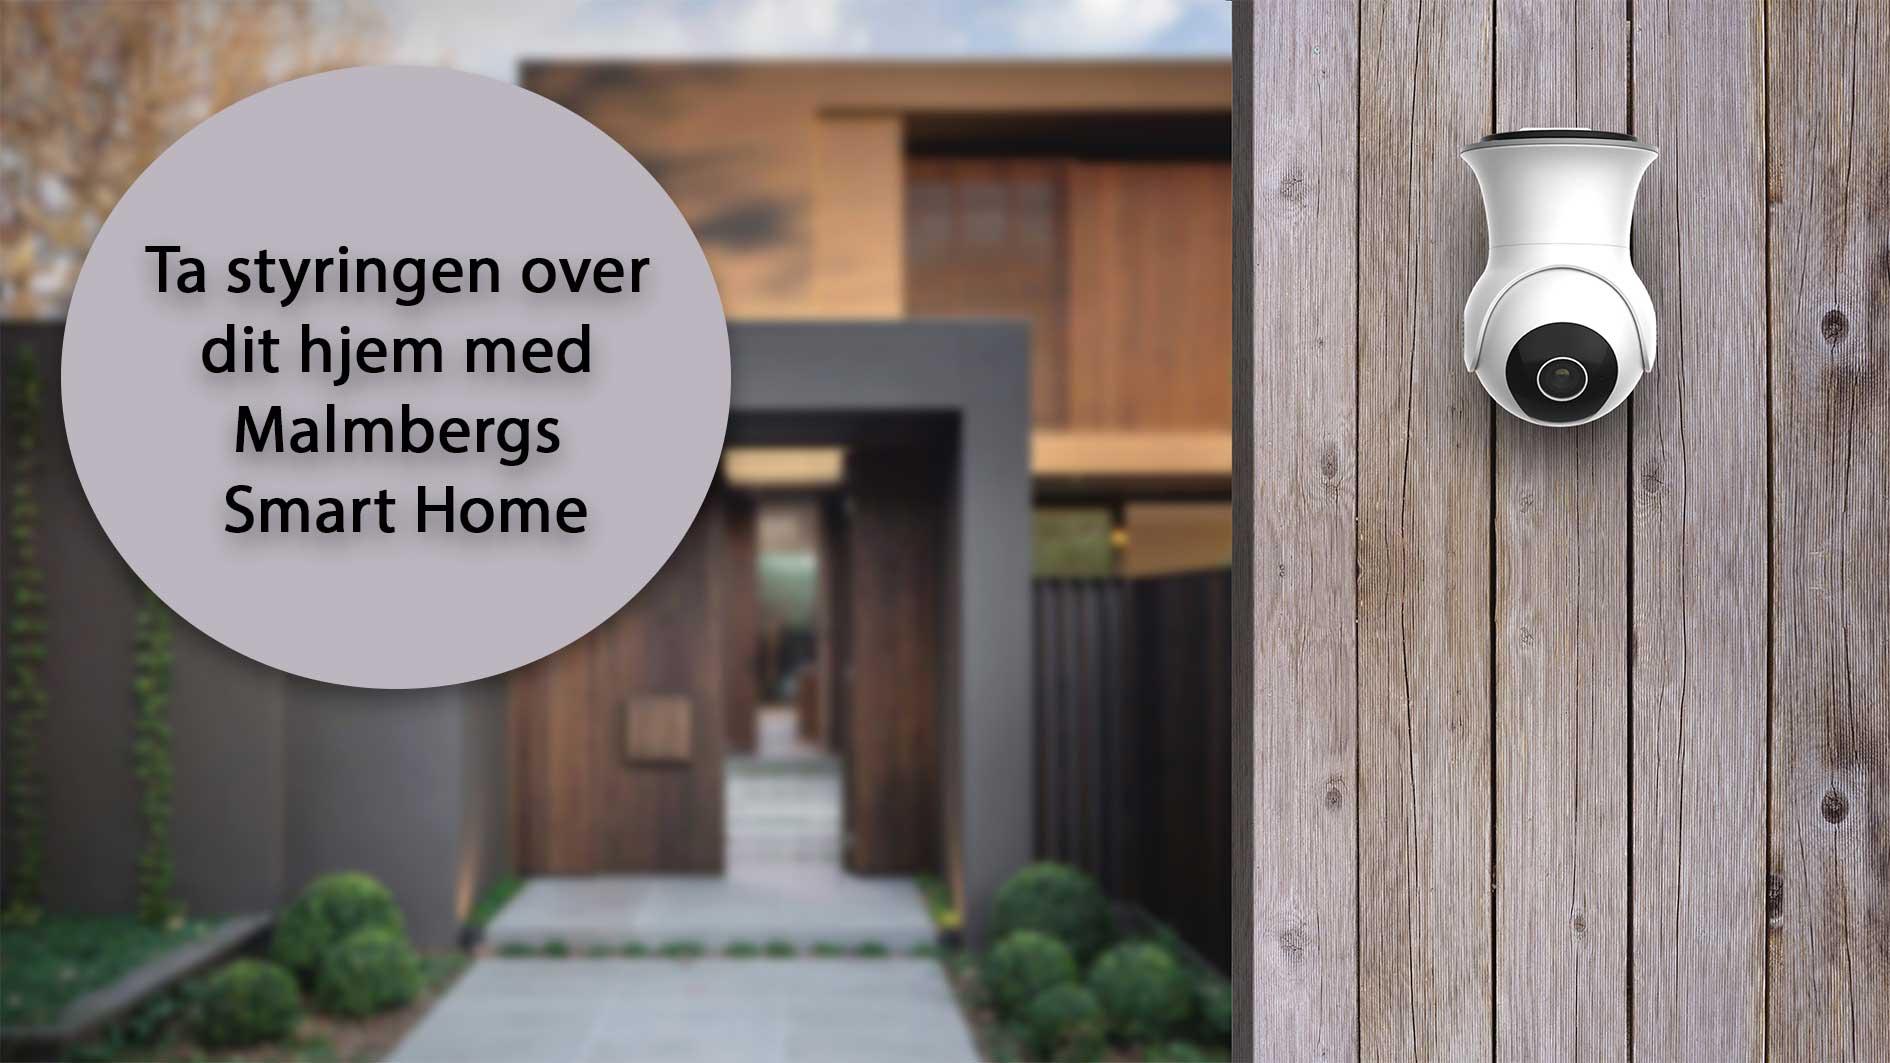 Smart Home Jægerspris